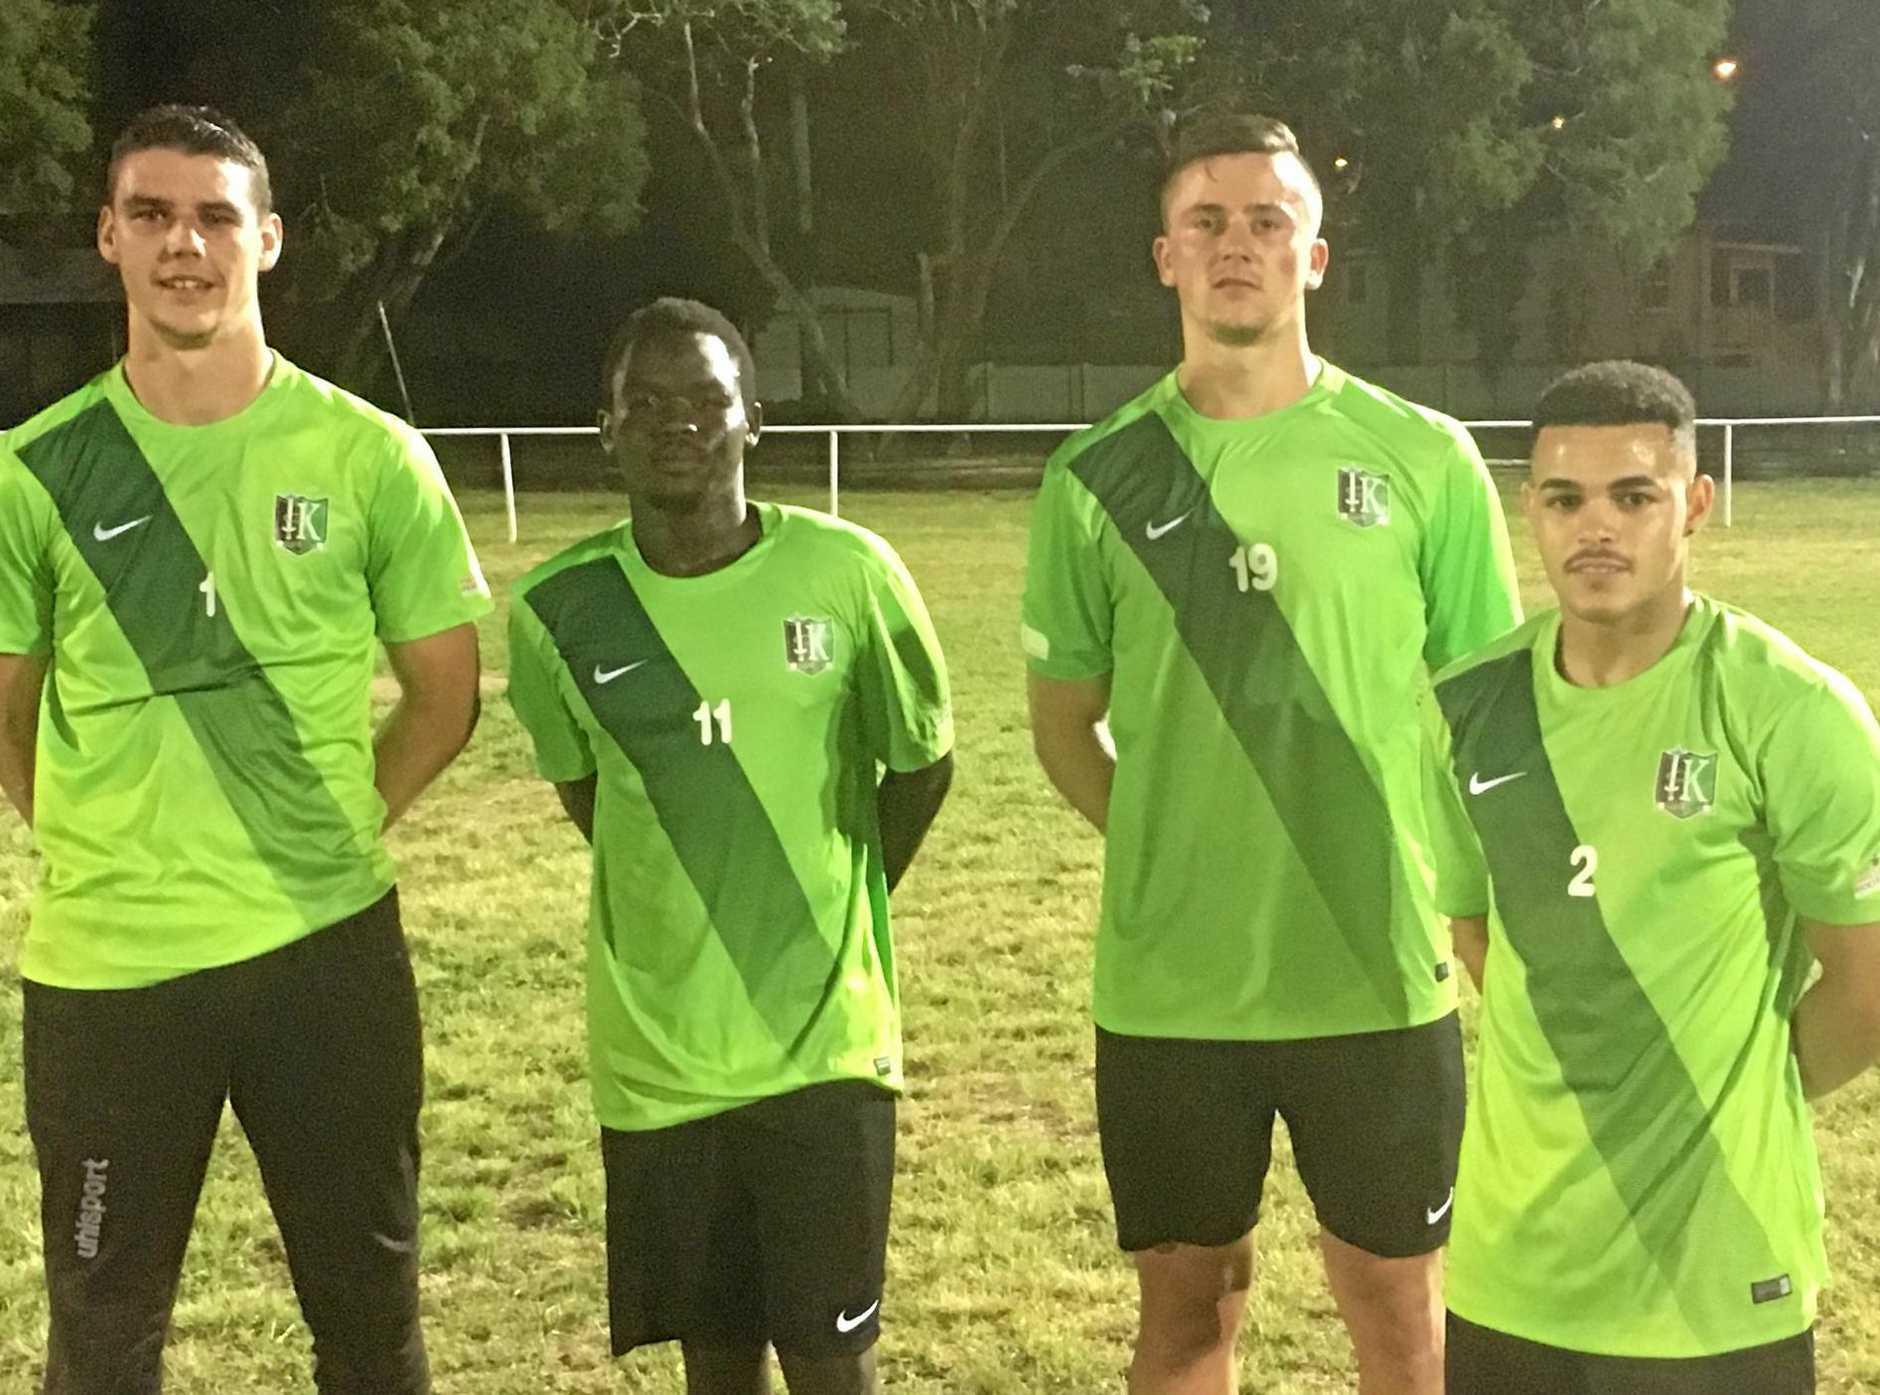 Ipswich Knights 2017 season signings Declan Murphy, Tarig Hammond, Adjen Salihovik and Jason Pillay.